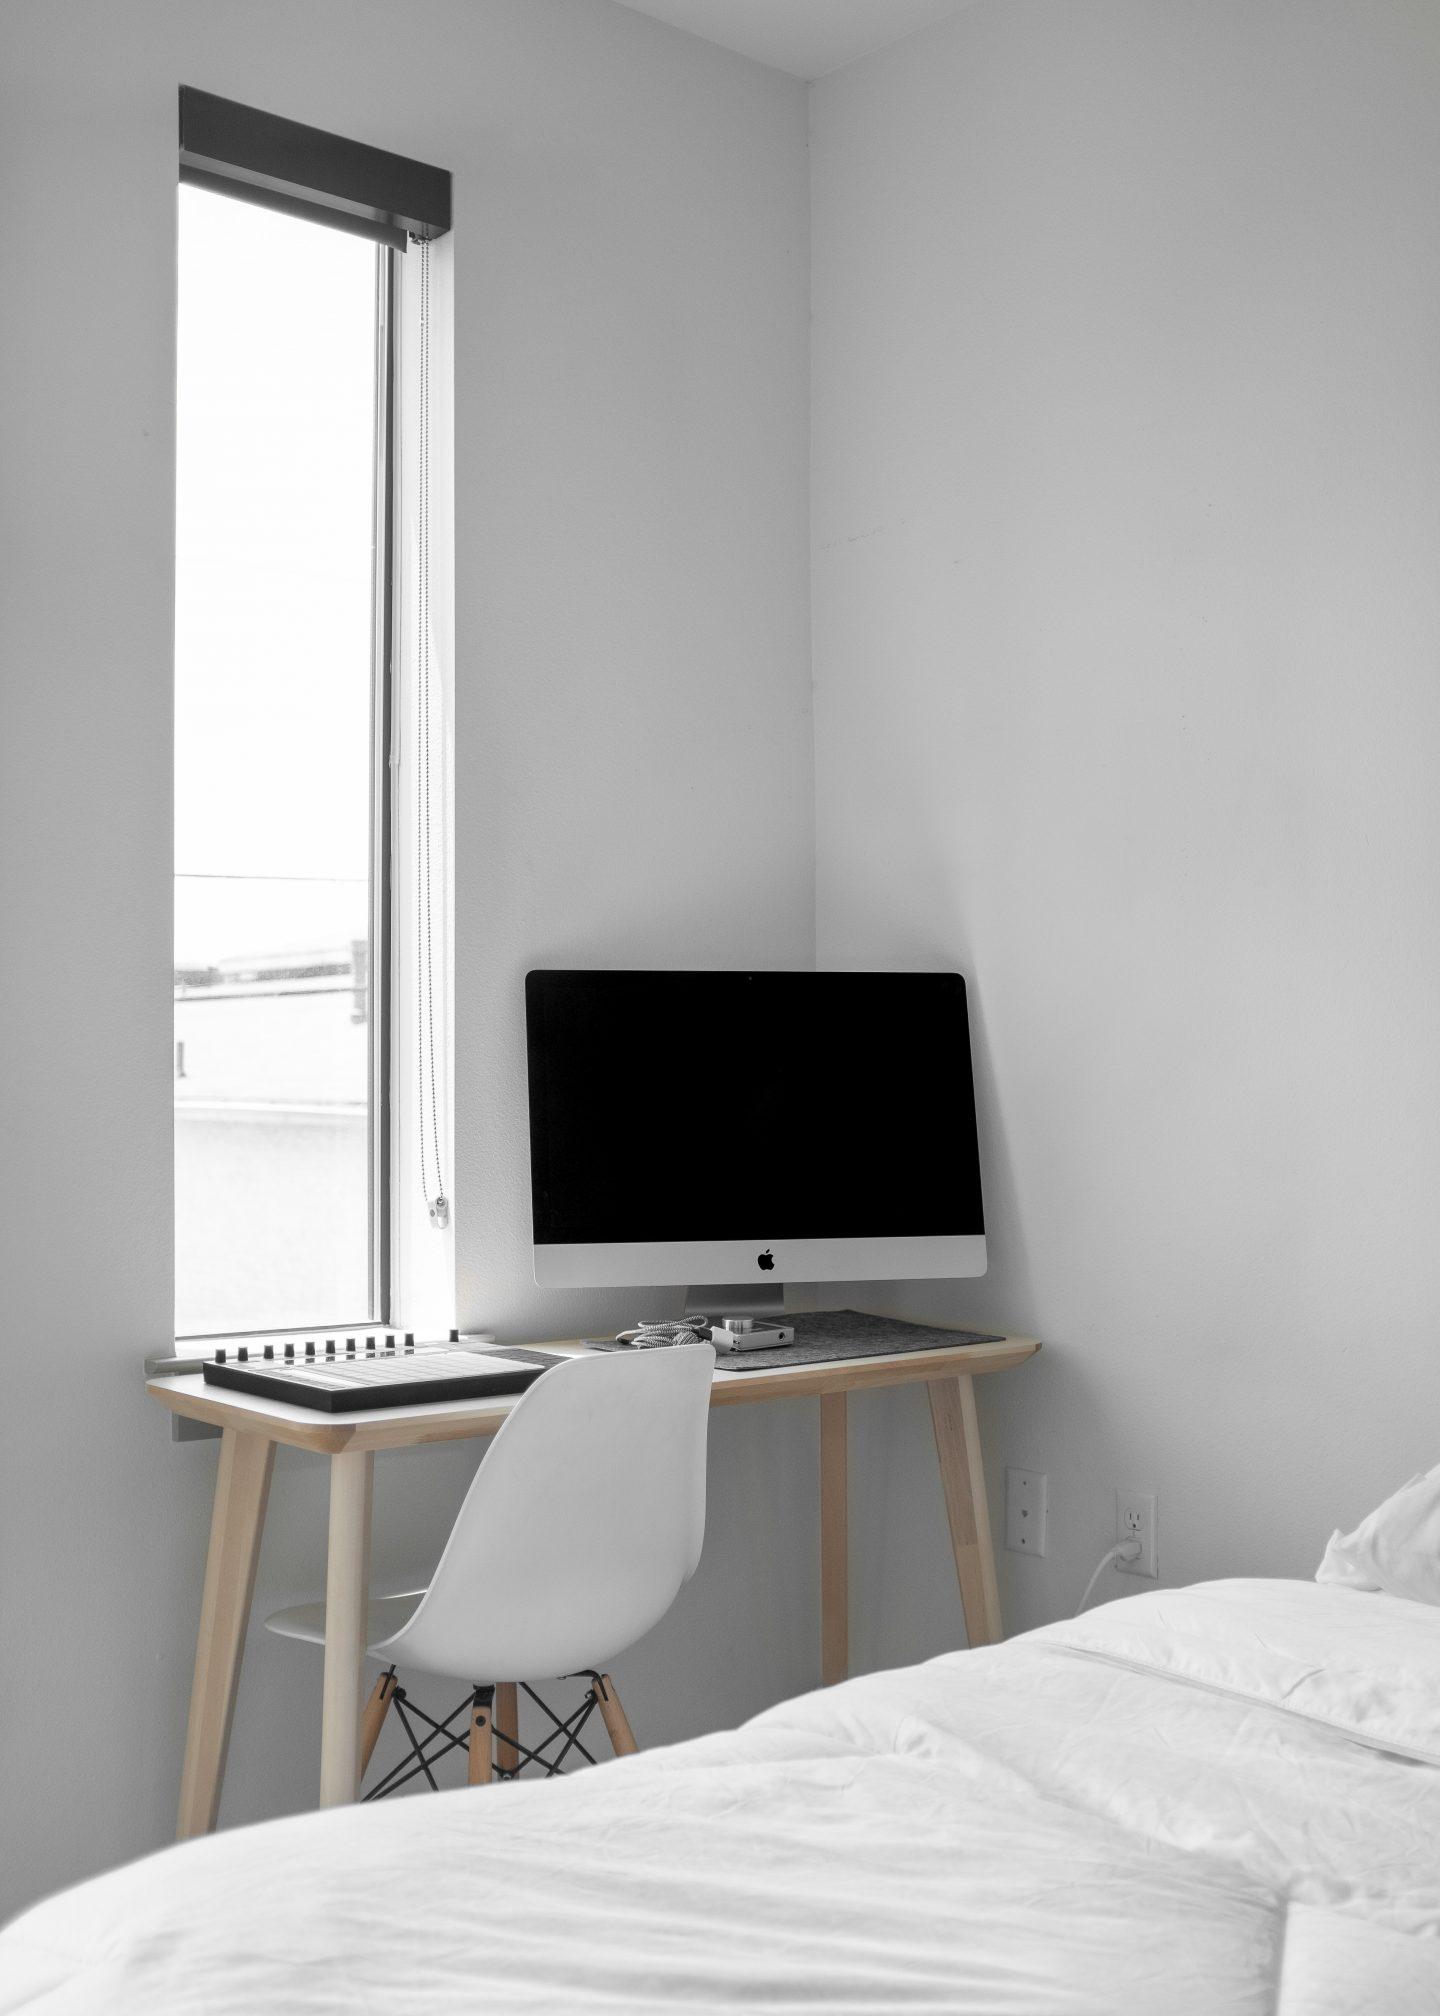 small bedroom window